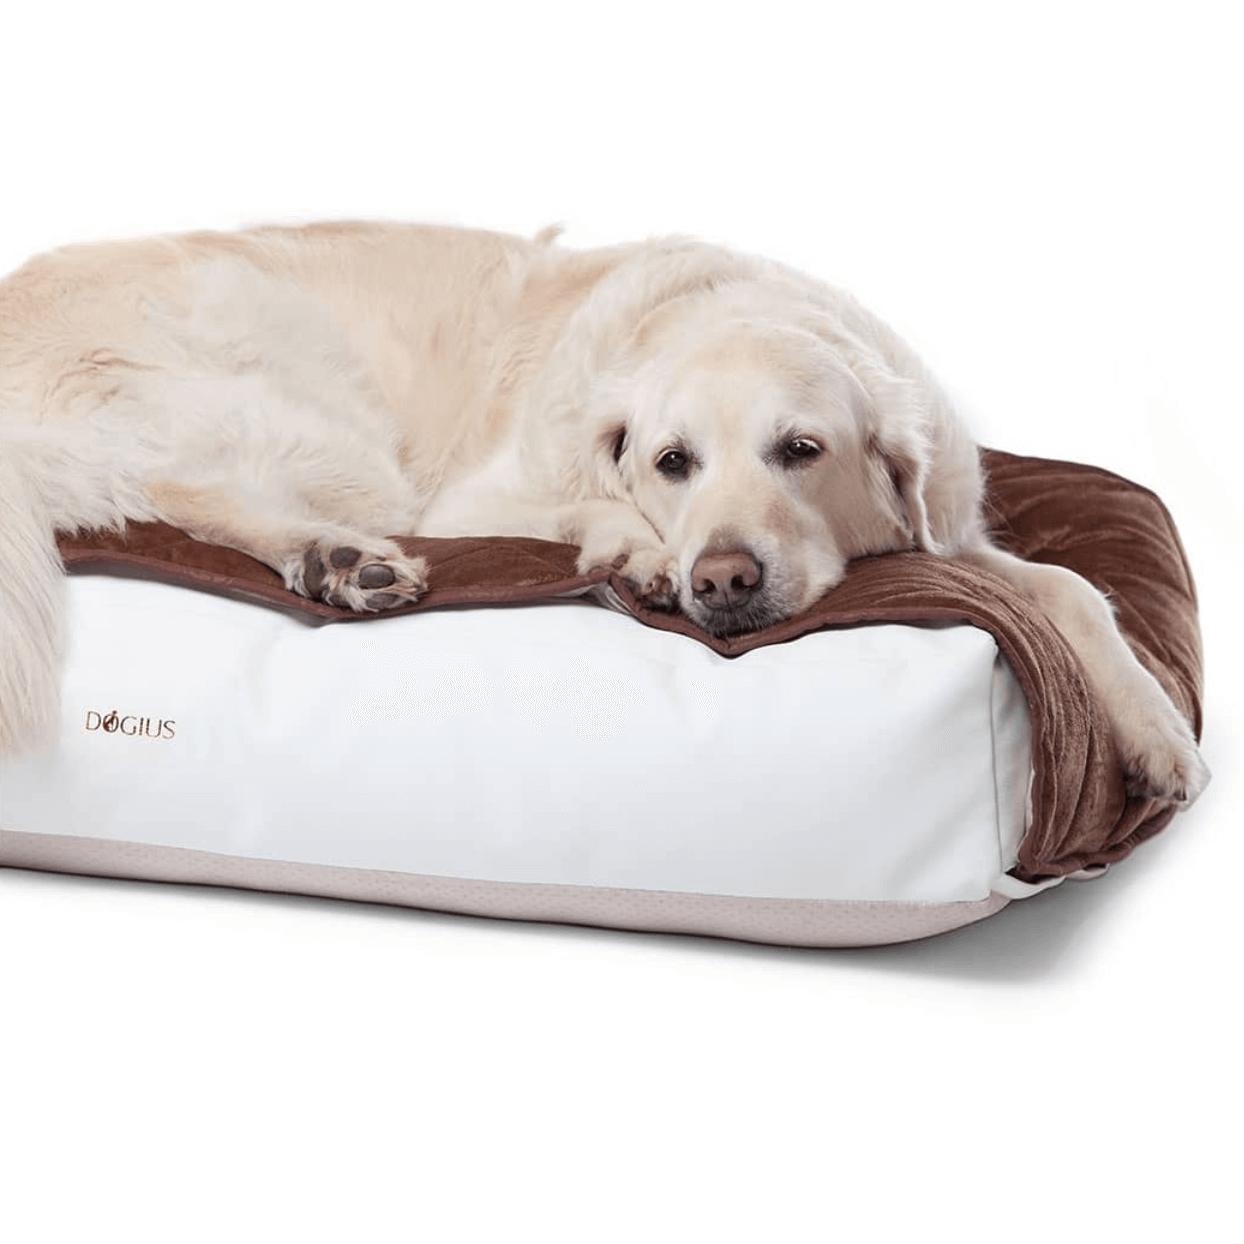 Dogius Hundebett Schlafsystem Onlineshop